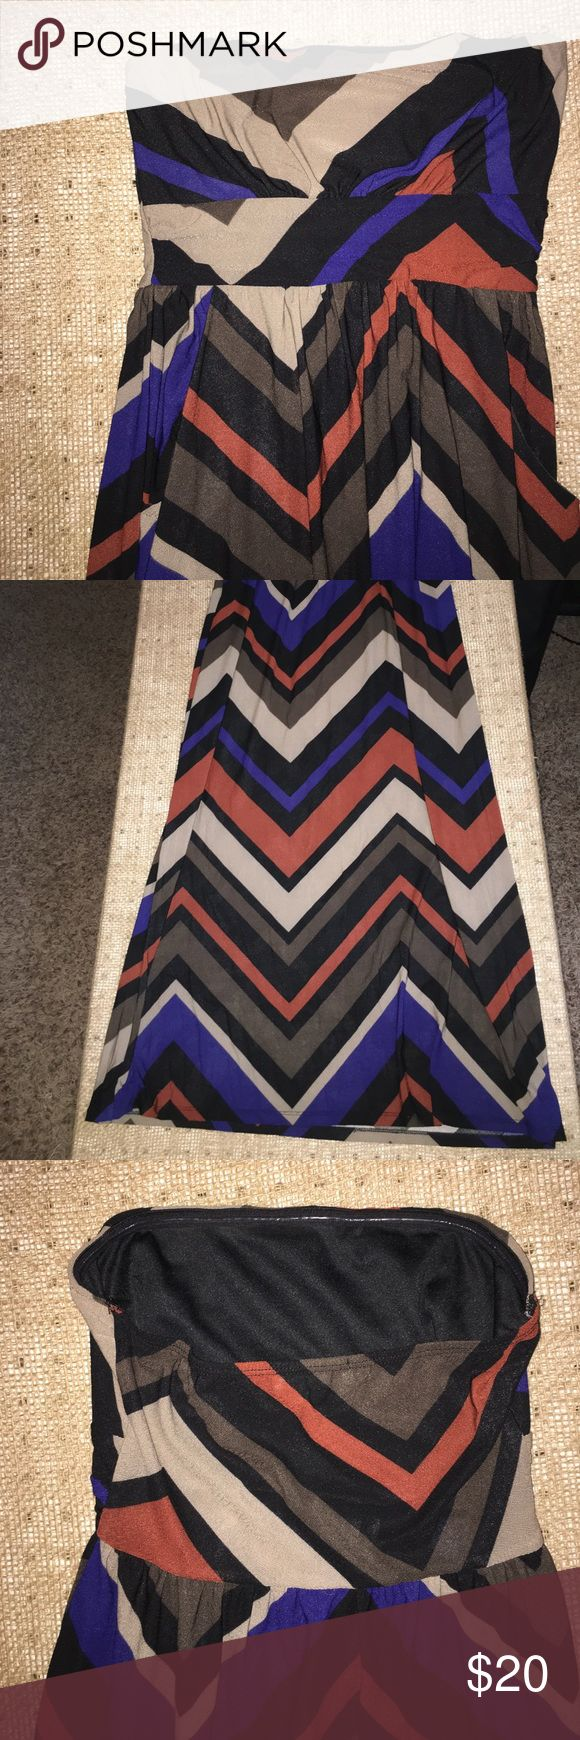 Multi color maxi dress ~With Pockets~ Tube top Multi color long flowing maxi dress with individual pockets, Brand New, No zipper, Size [S] Toska Dresses Maxi